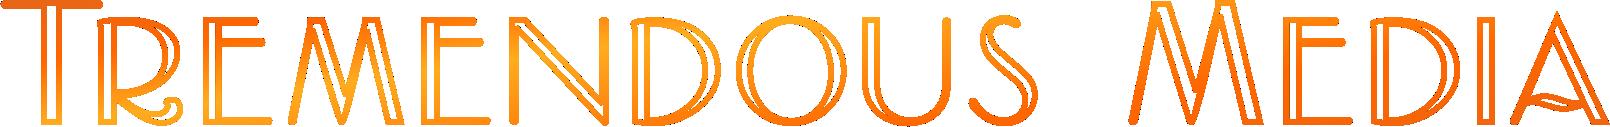 Trmendous Media Logo 5